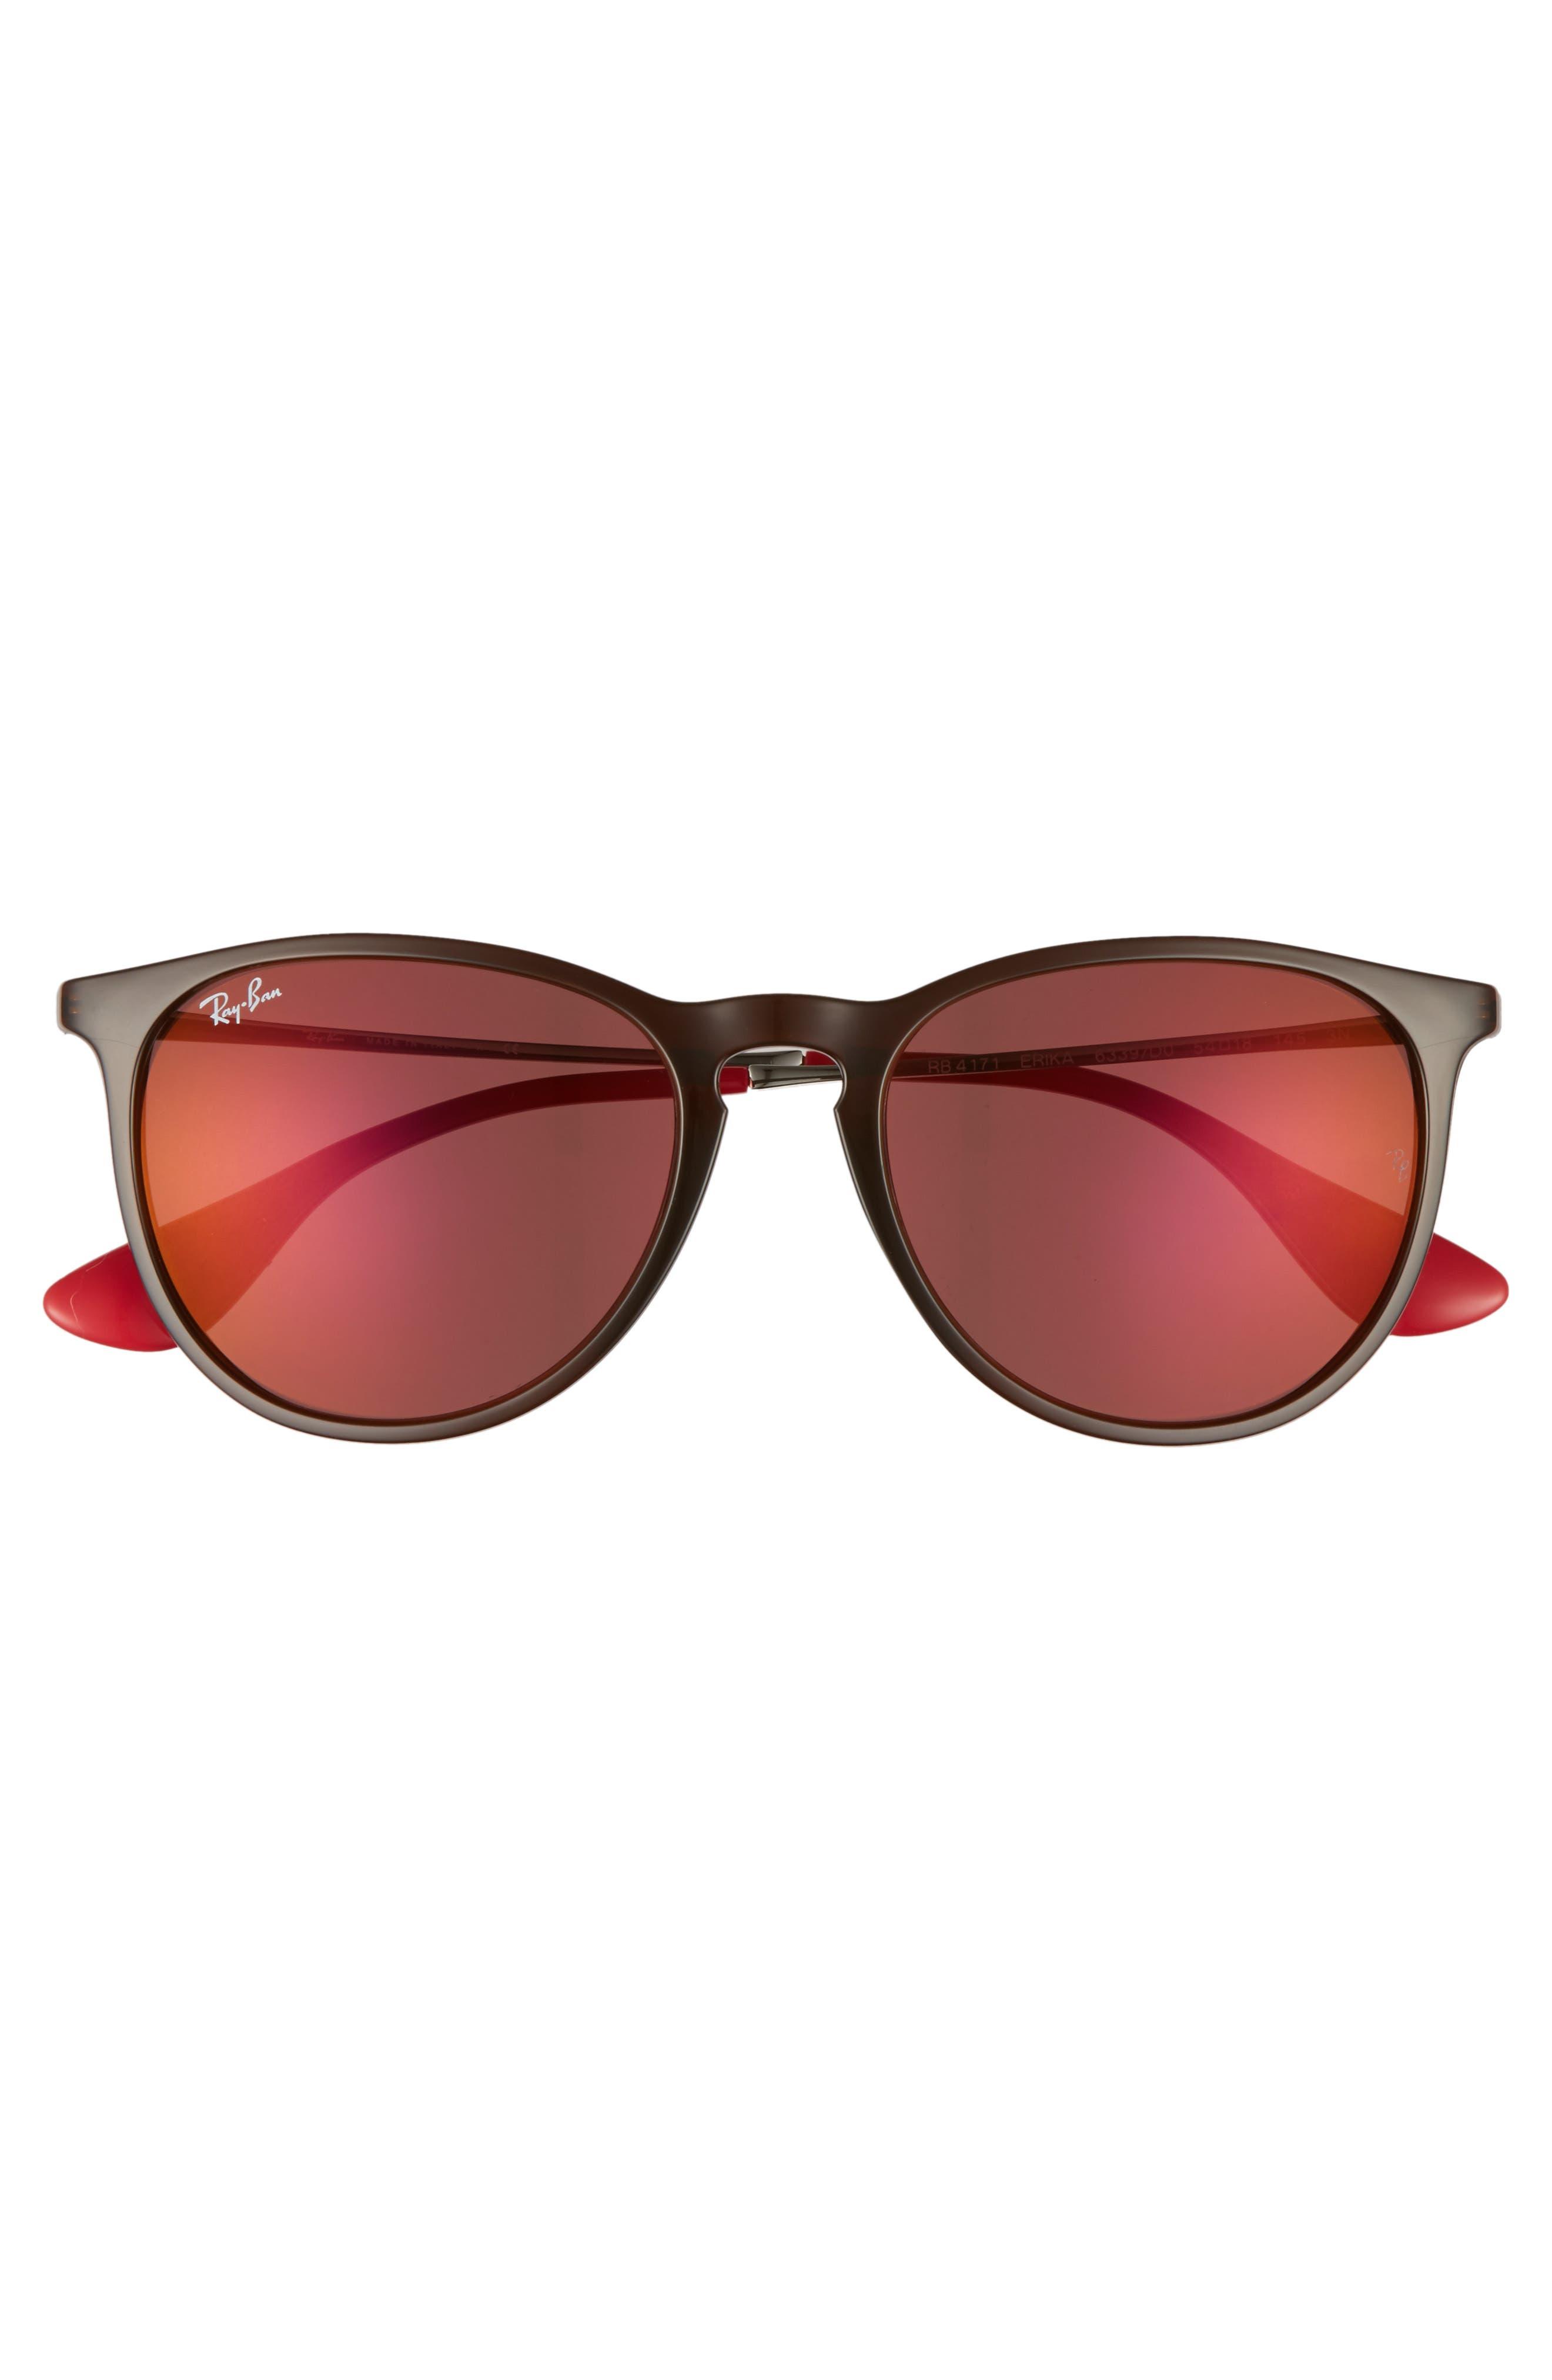 Erika Classic 54mm Sunglasses,                             Alternate thumbnail 2, color,                             Brown